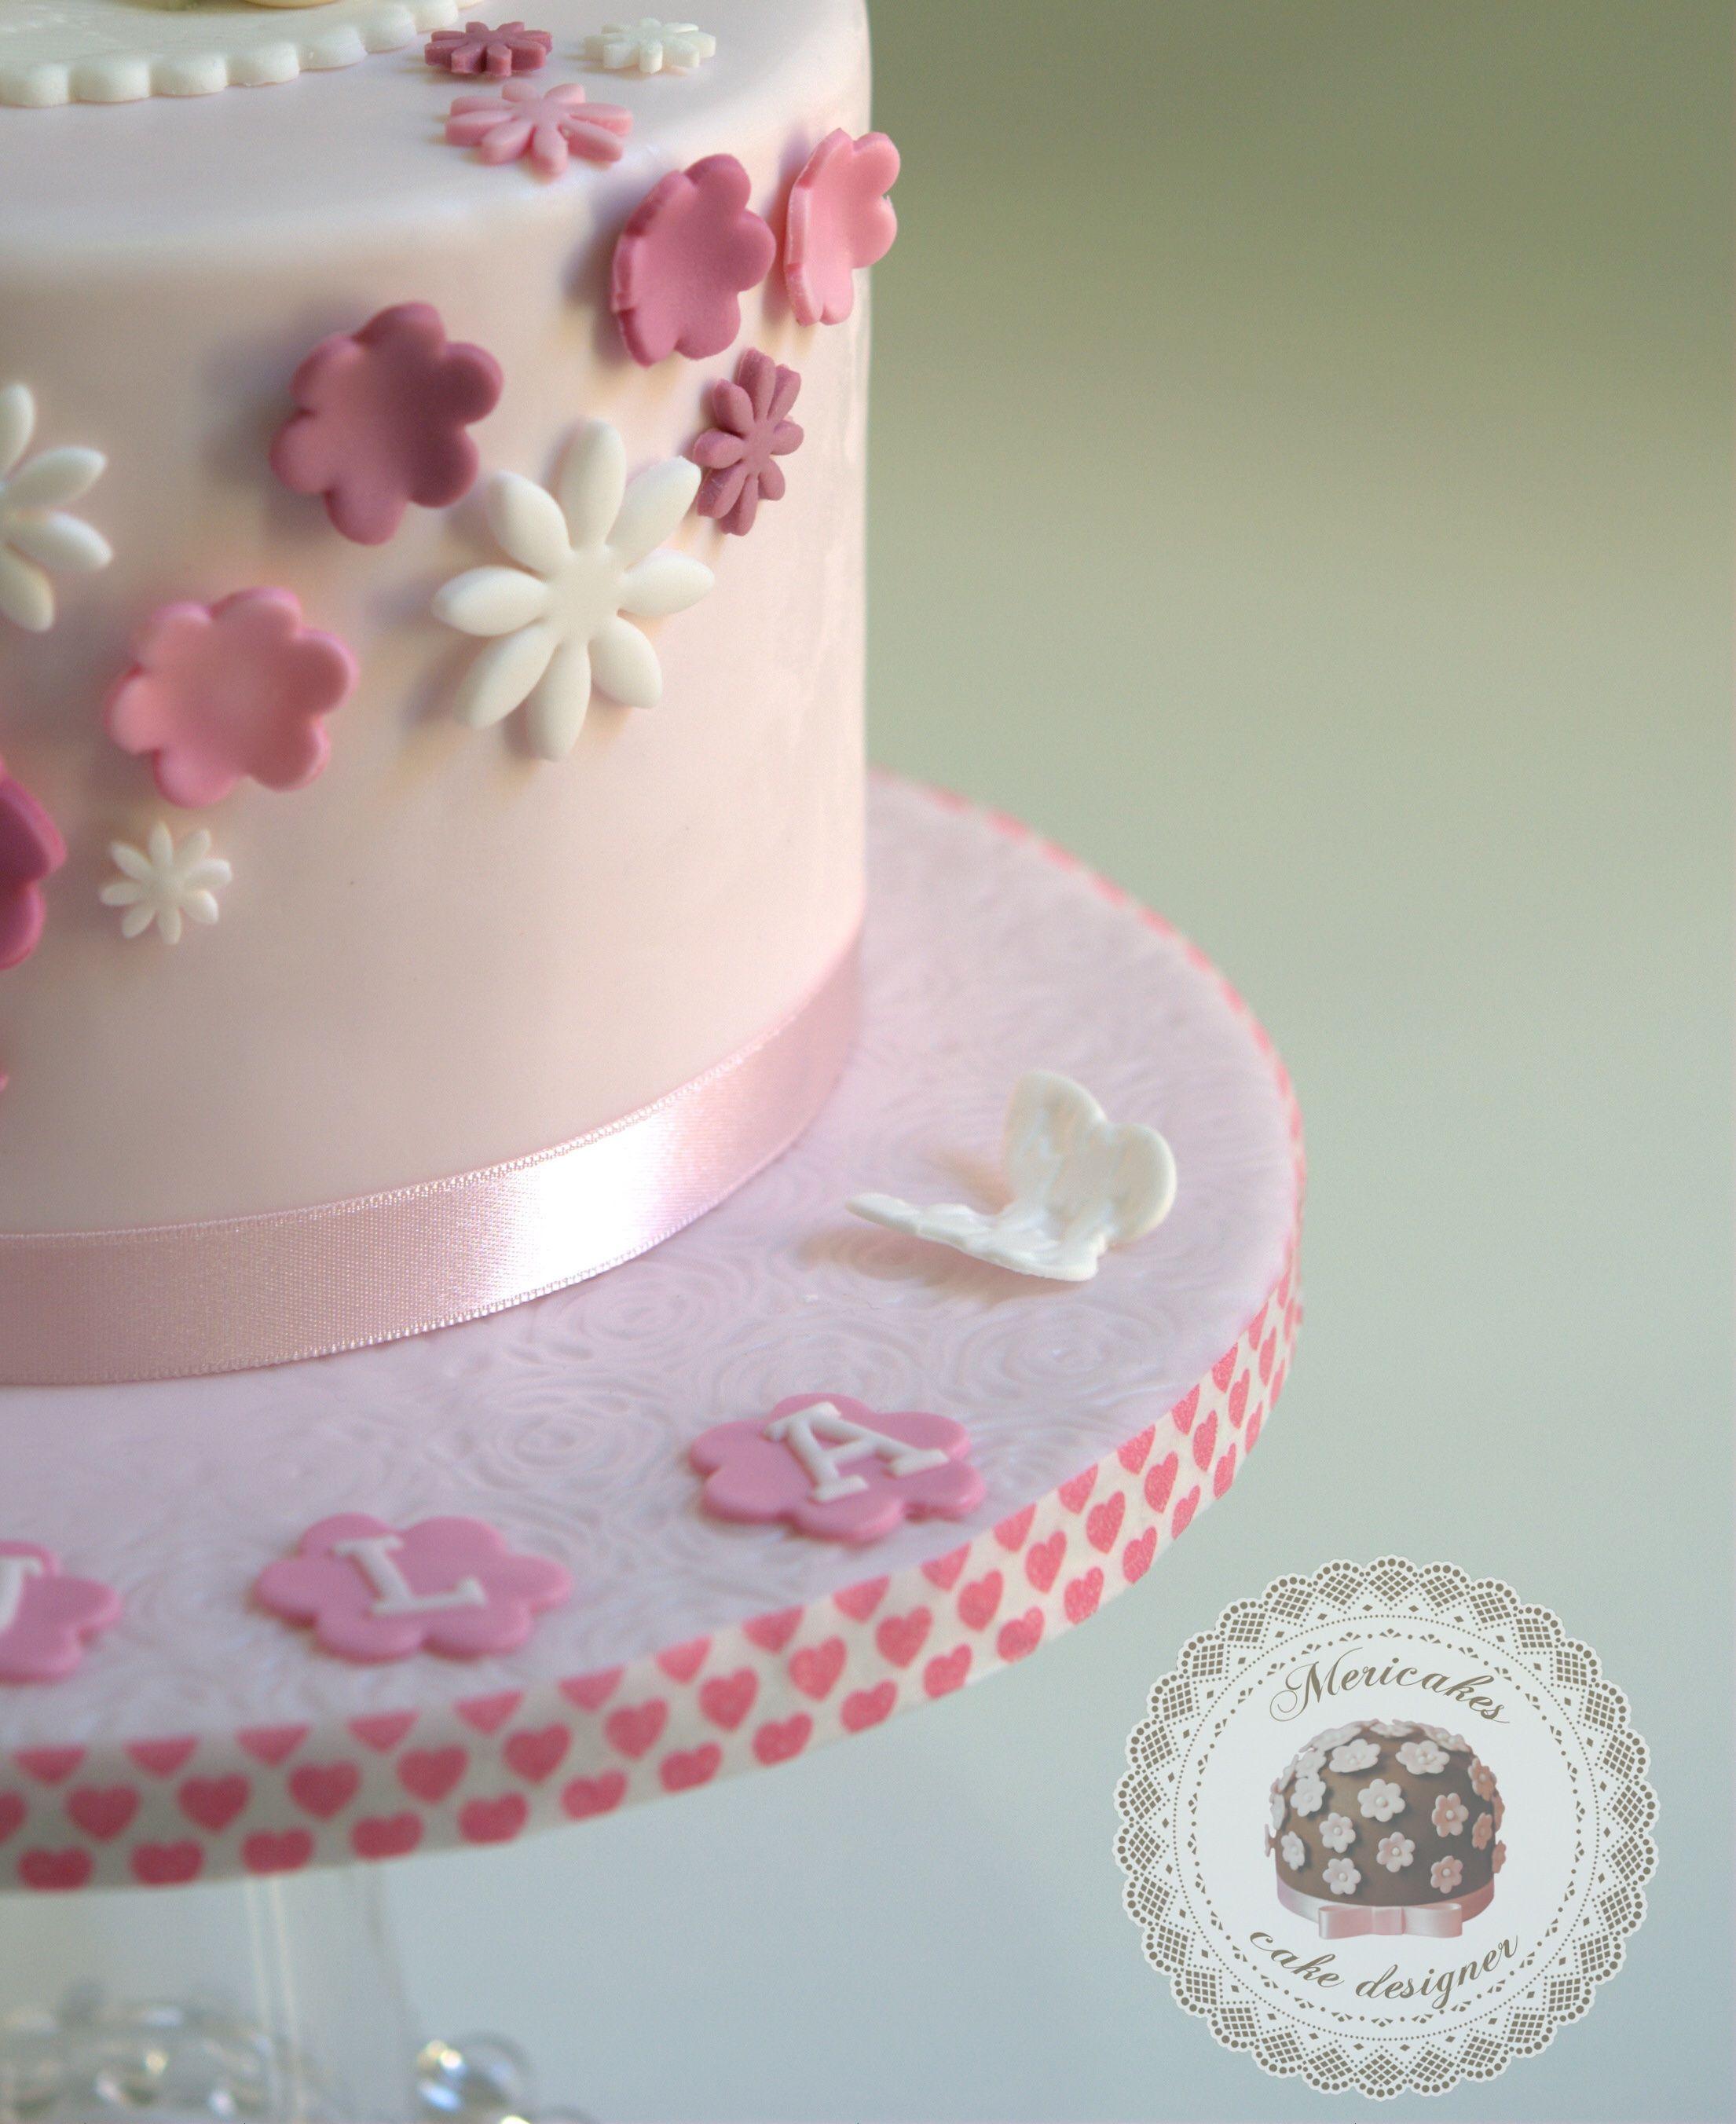 Decoracion de tortas para bautismo con fondant buscar for Decoracion de tortas infantiles